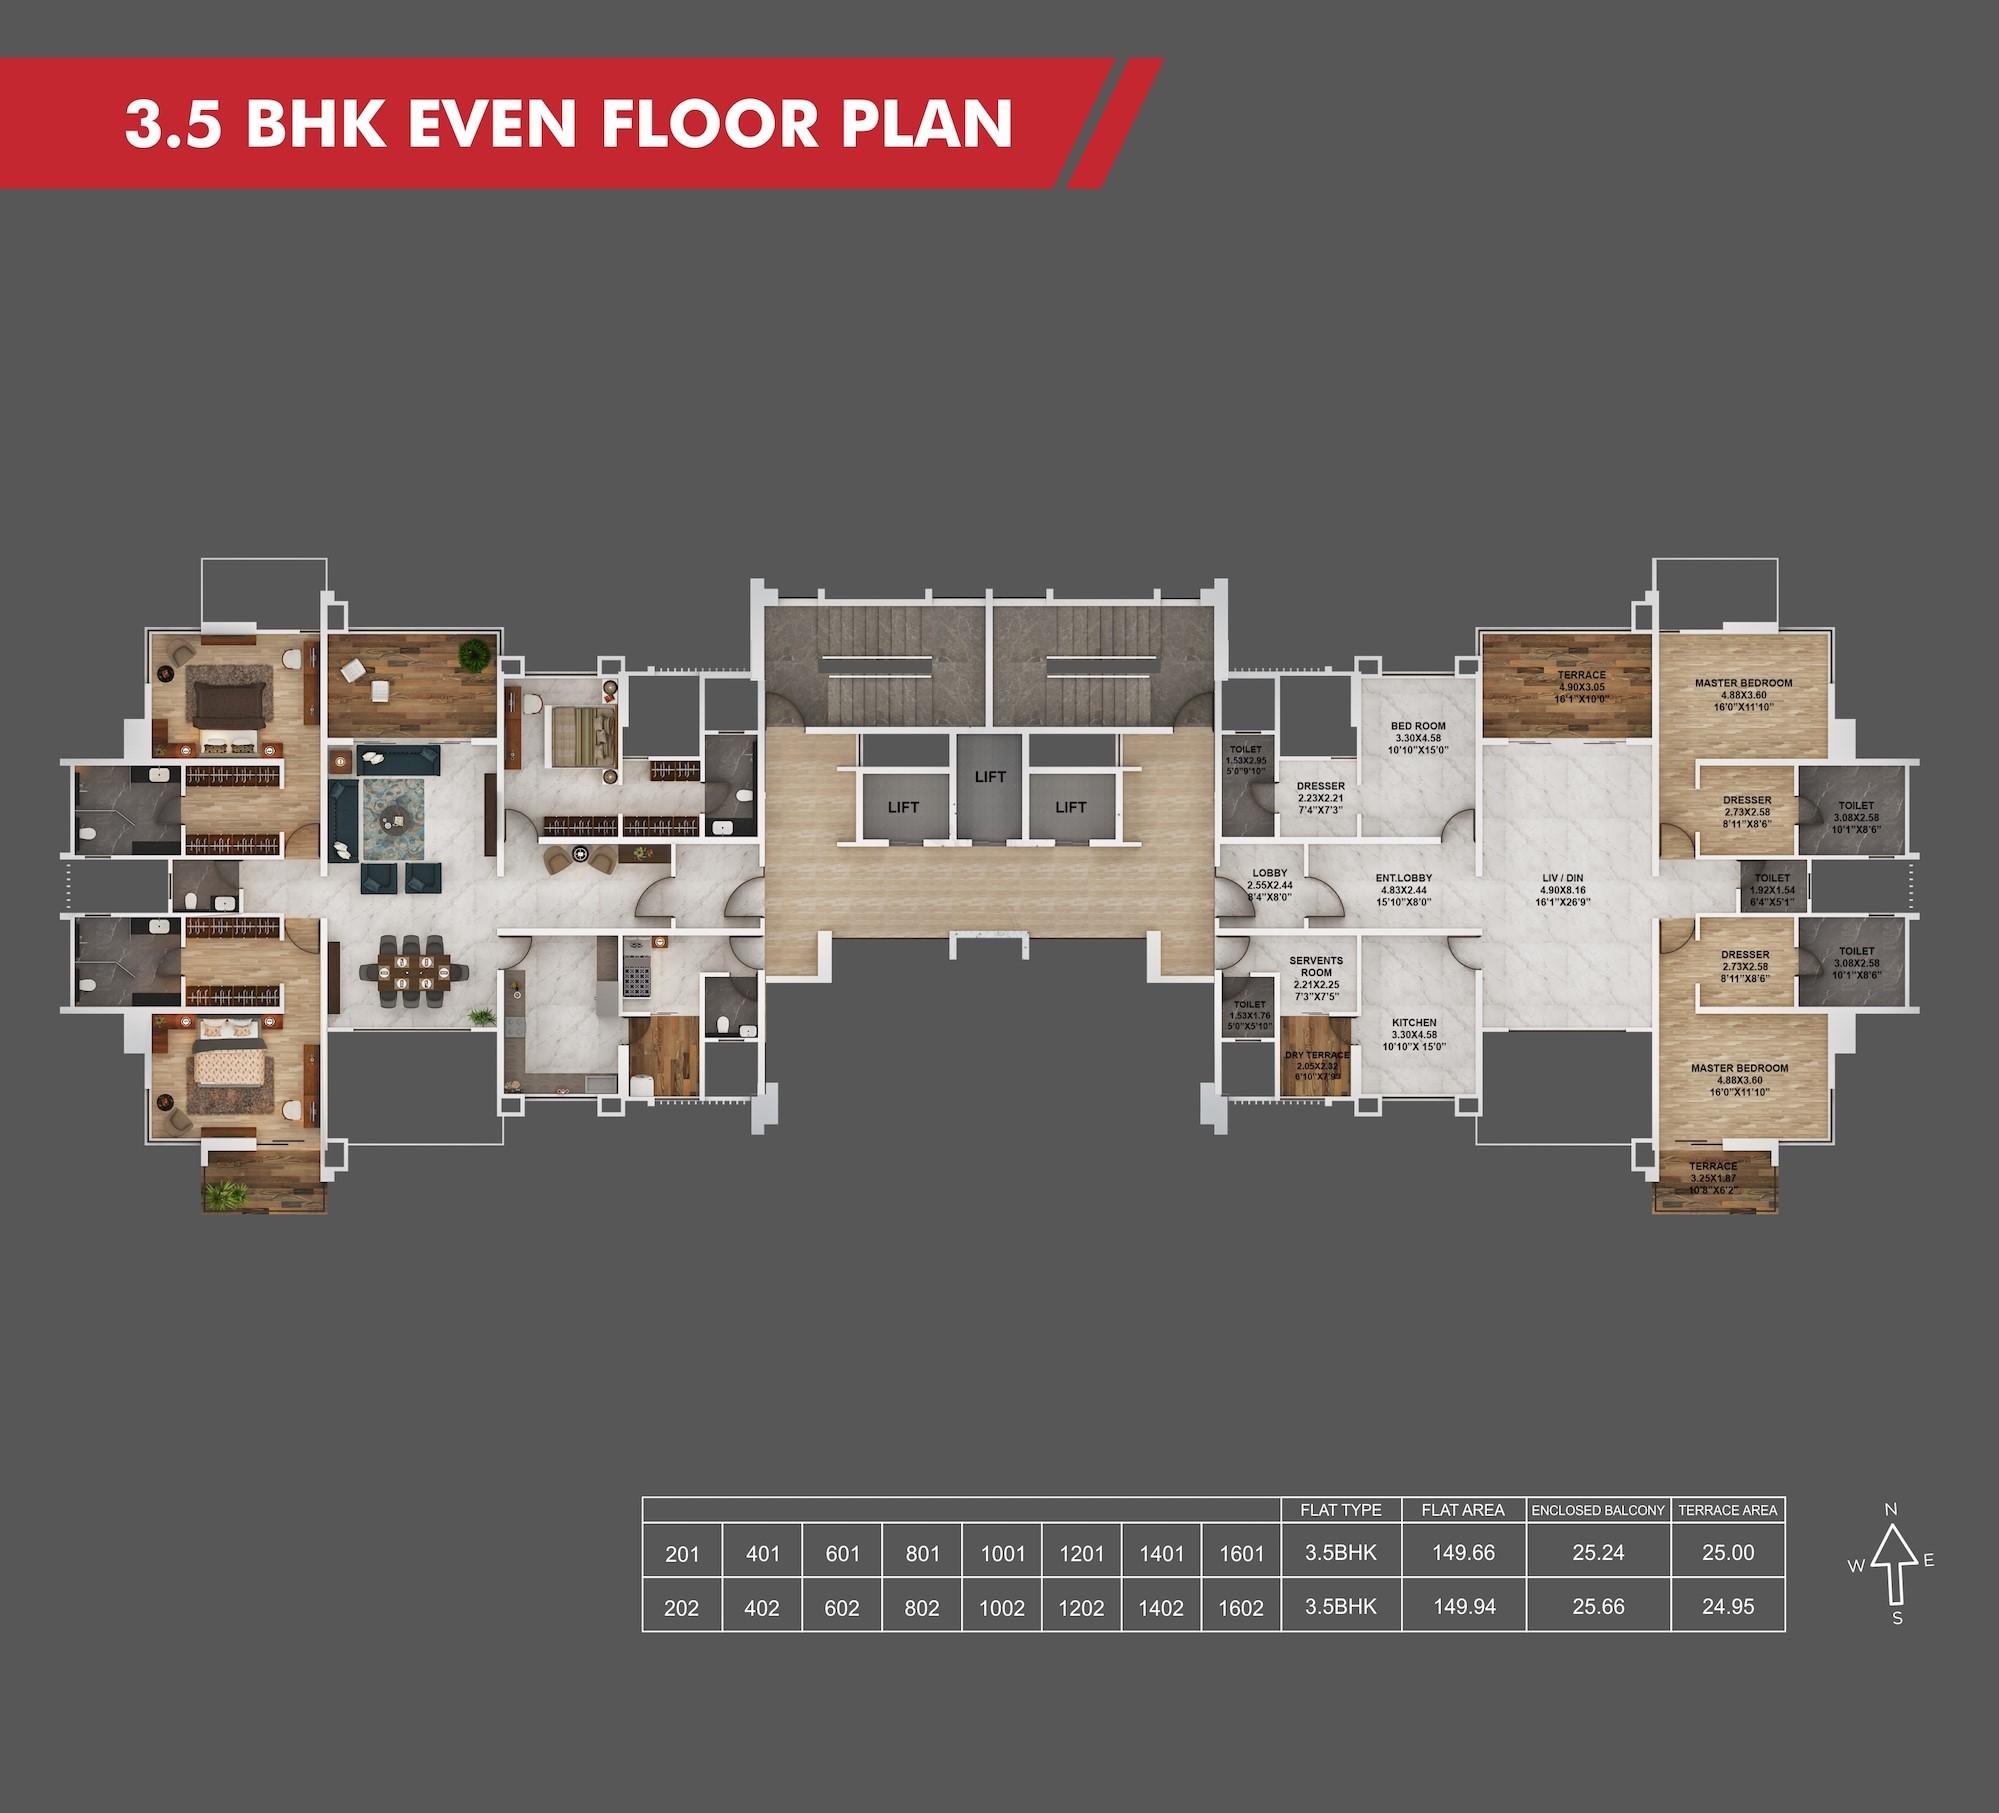 Sanctum 3.5BHK Even Floor Plan